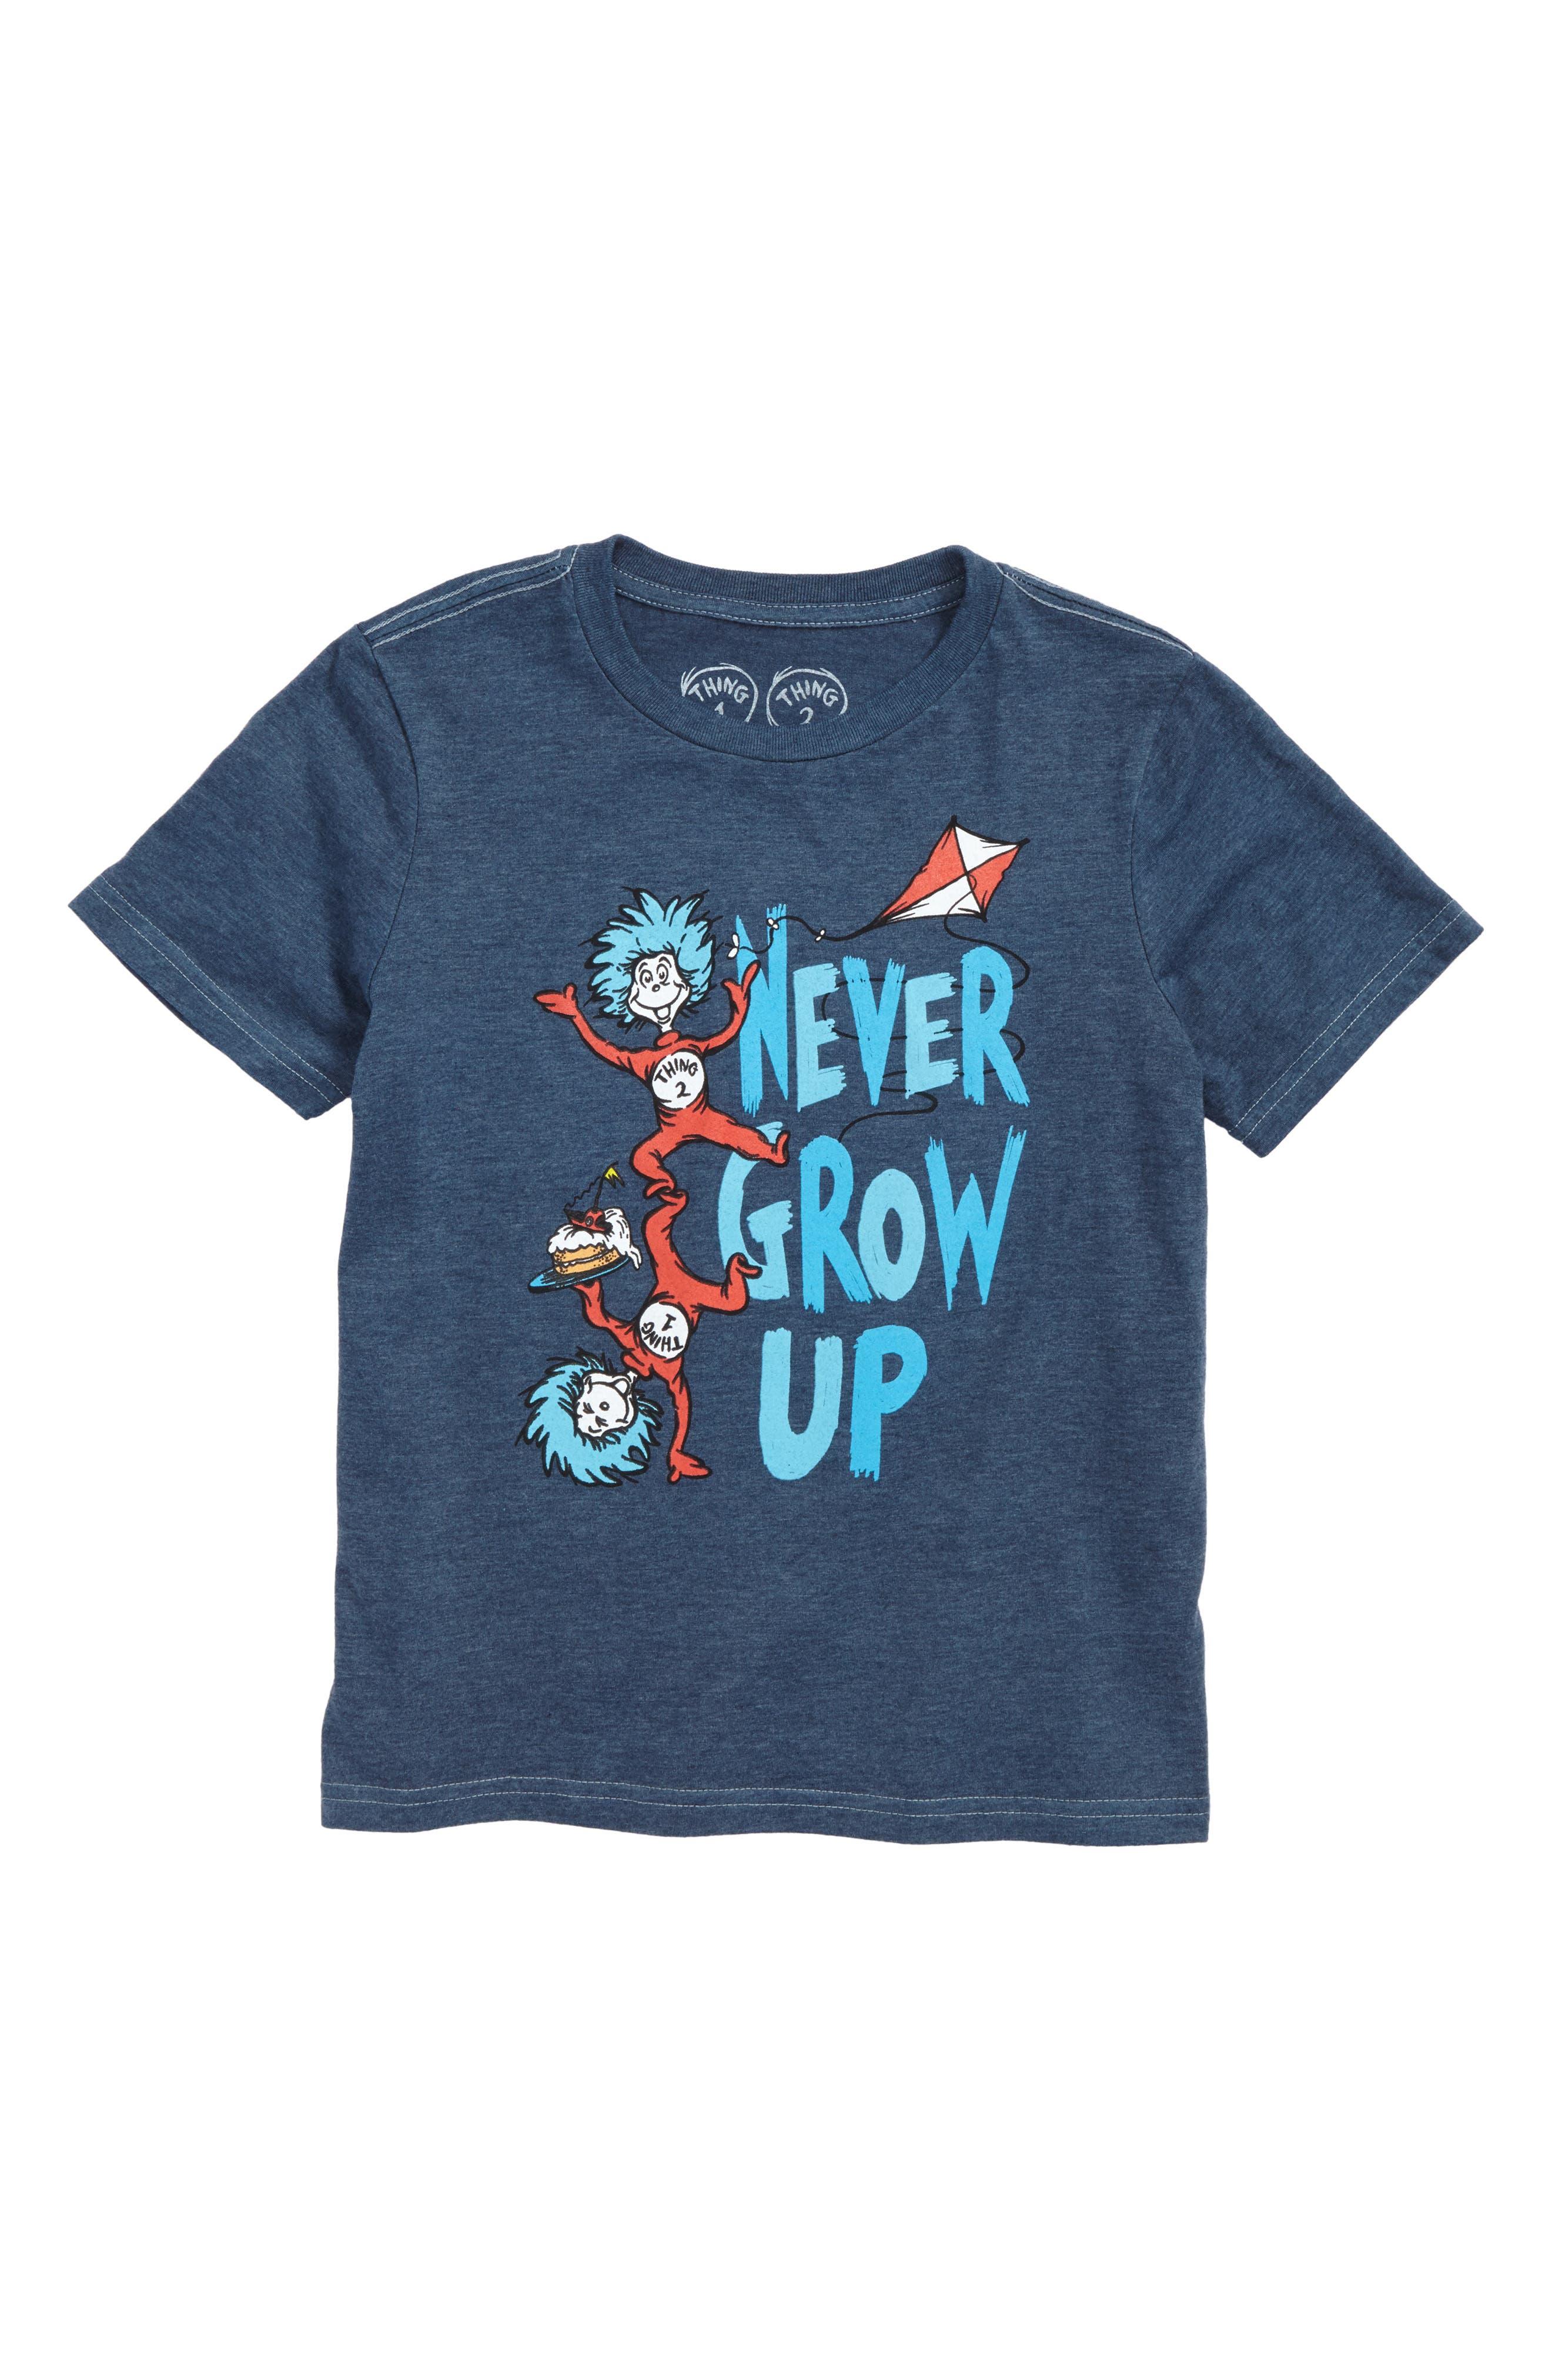 x Dr. Seuss Never Grow Up Graphic T-Shirt,                             Main thumbnail 1, color,                             400